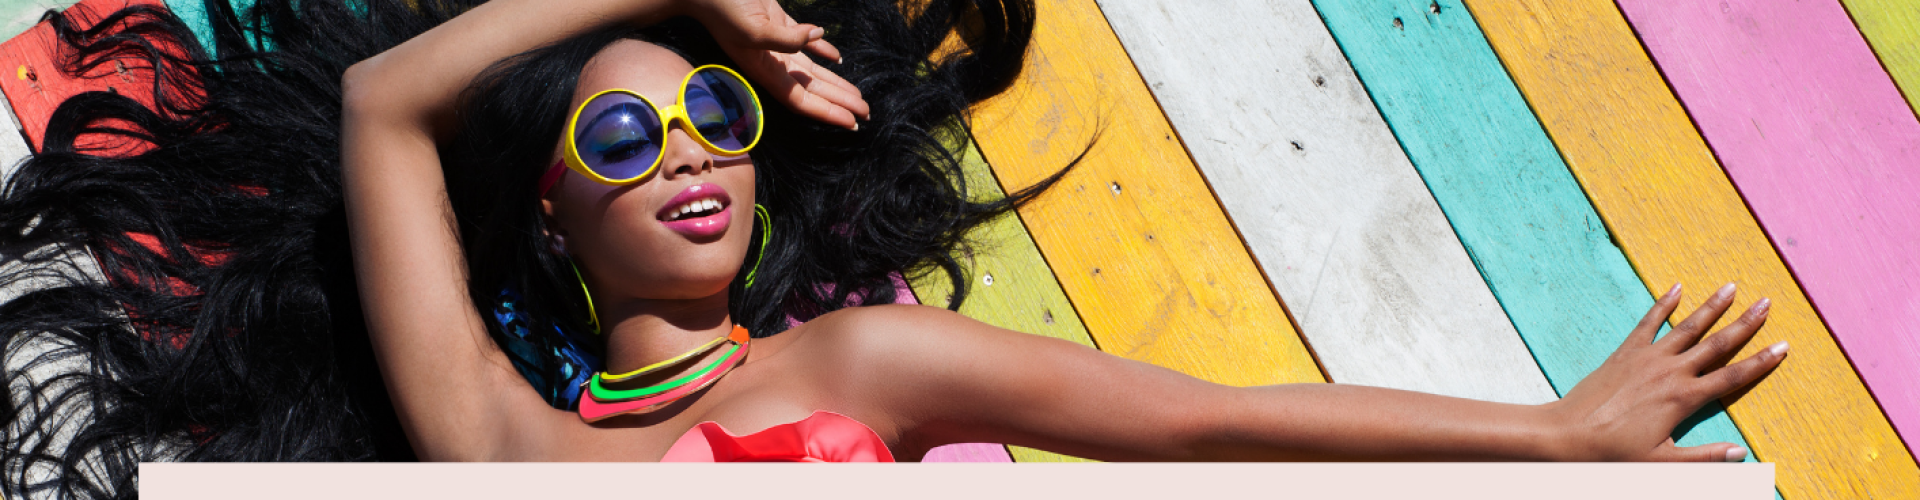 Hoe goed bescherm jij je donkere huid tegen de zon?